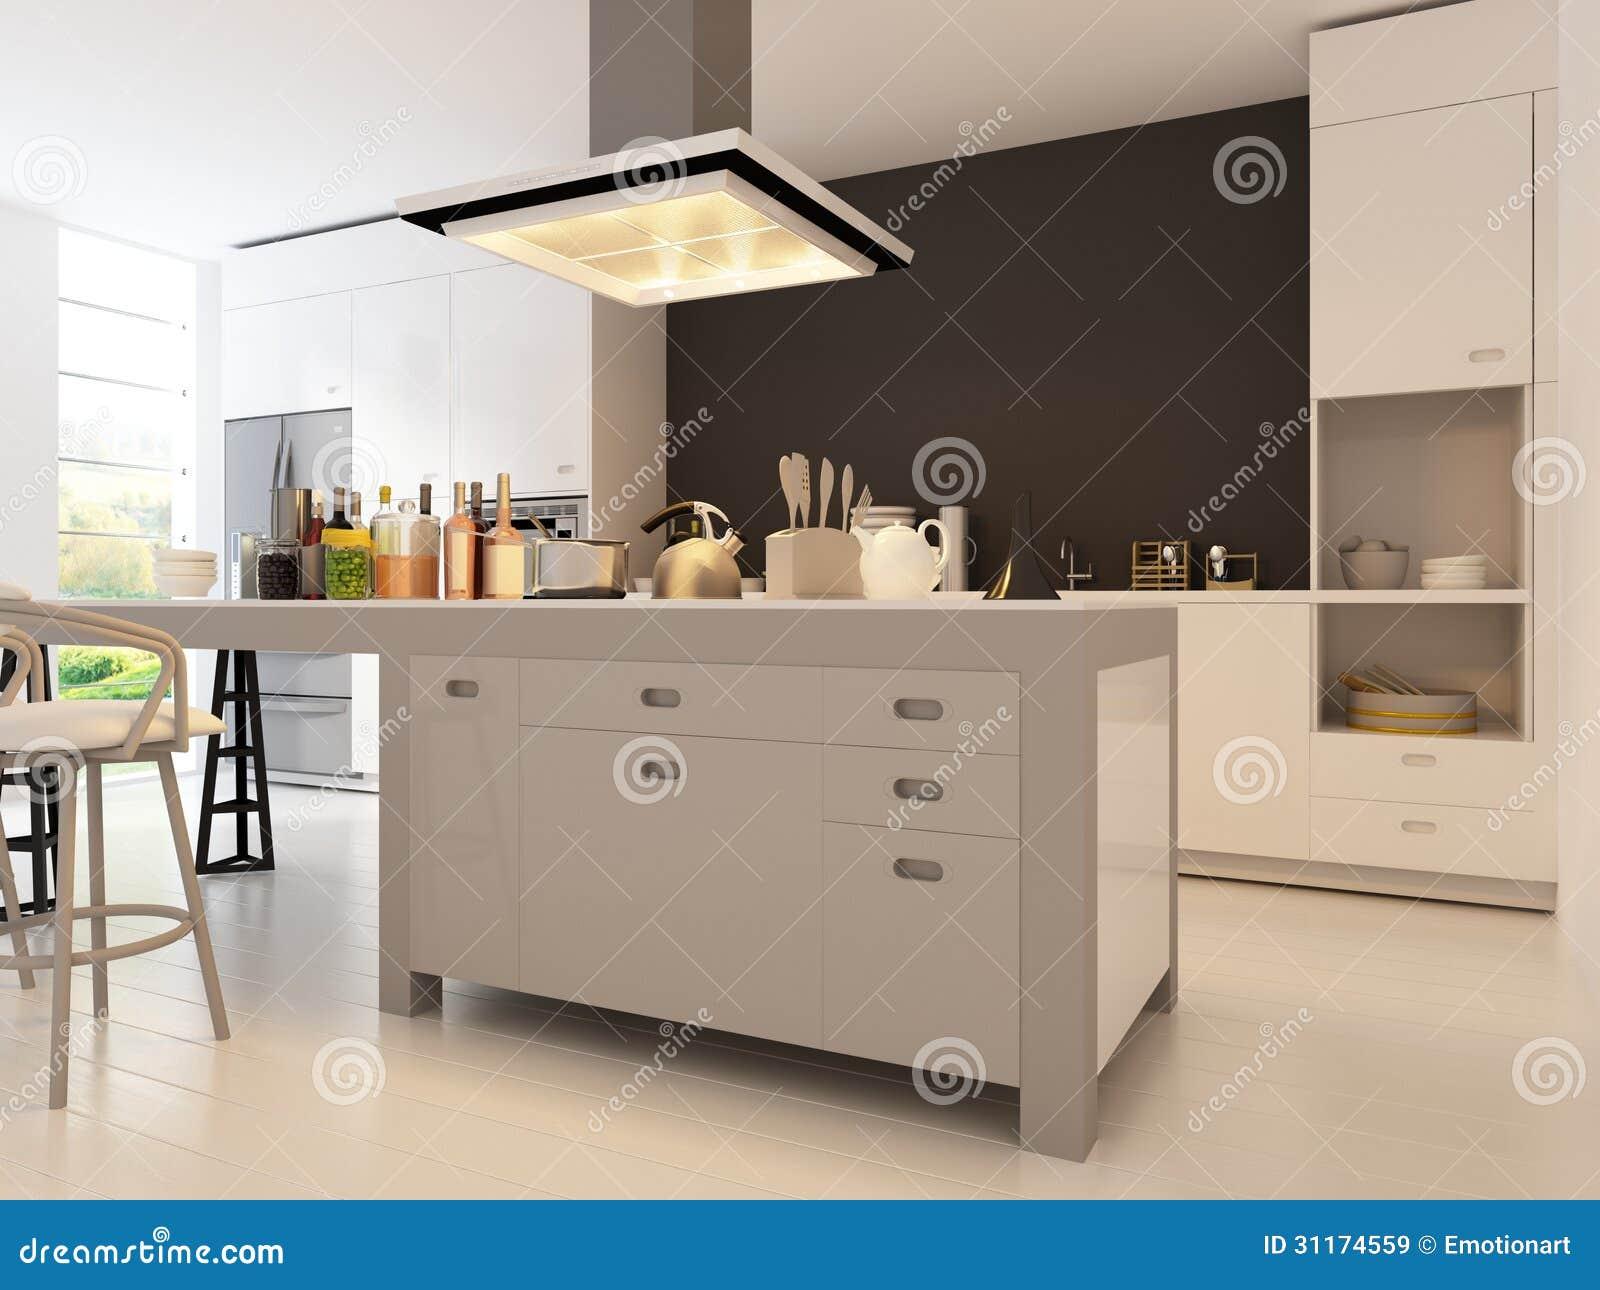 Stock Royalty Free: Cozinha do projeto moderno Arquitetura interior #81A229 1300x1065 Arquitetura Interior Banheiro